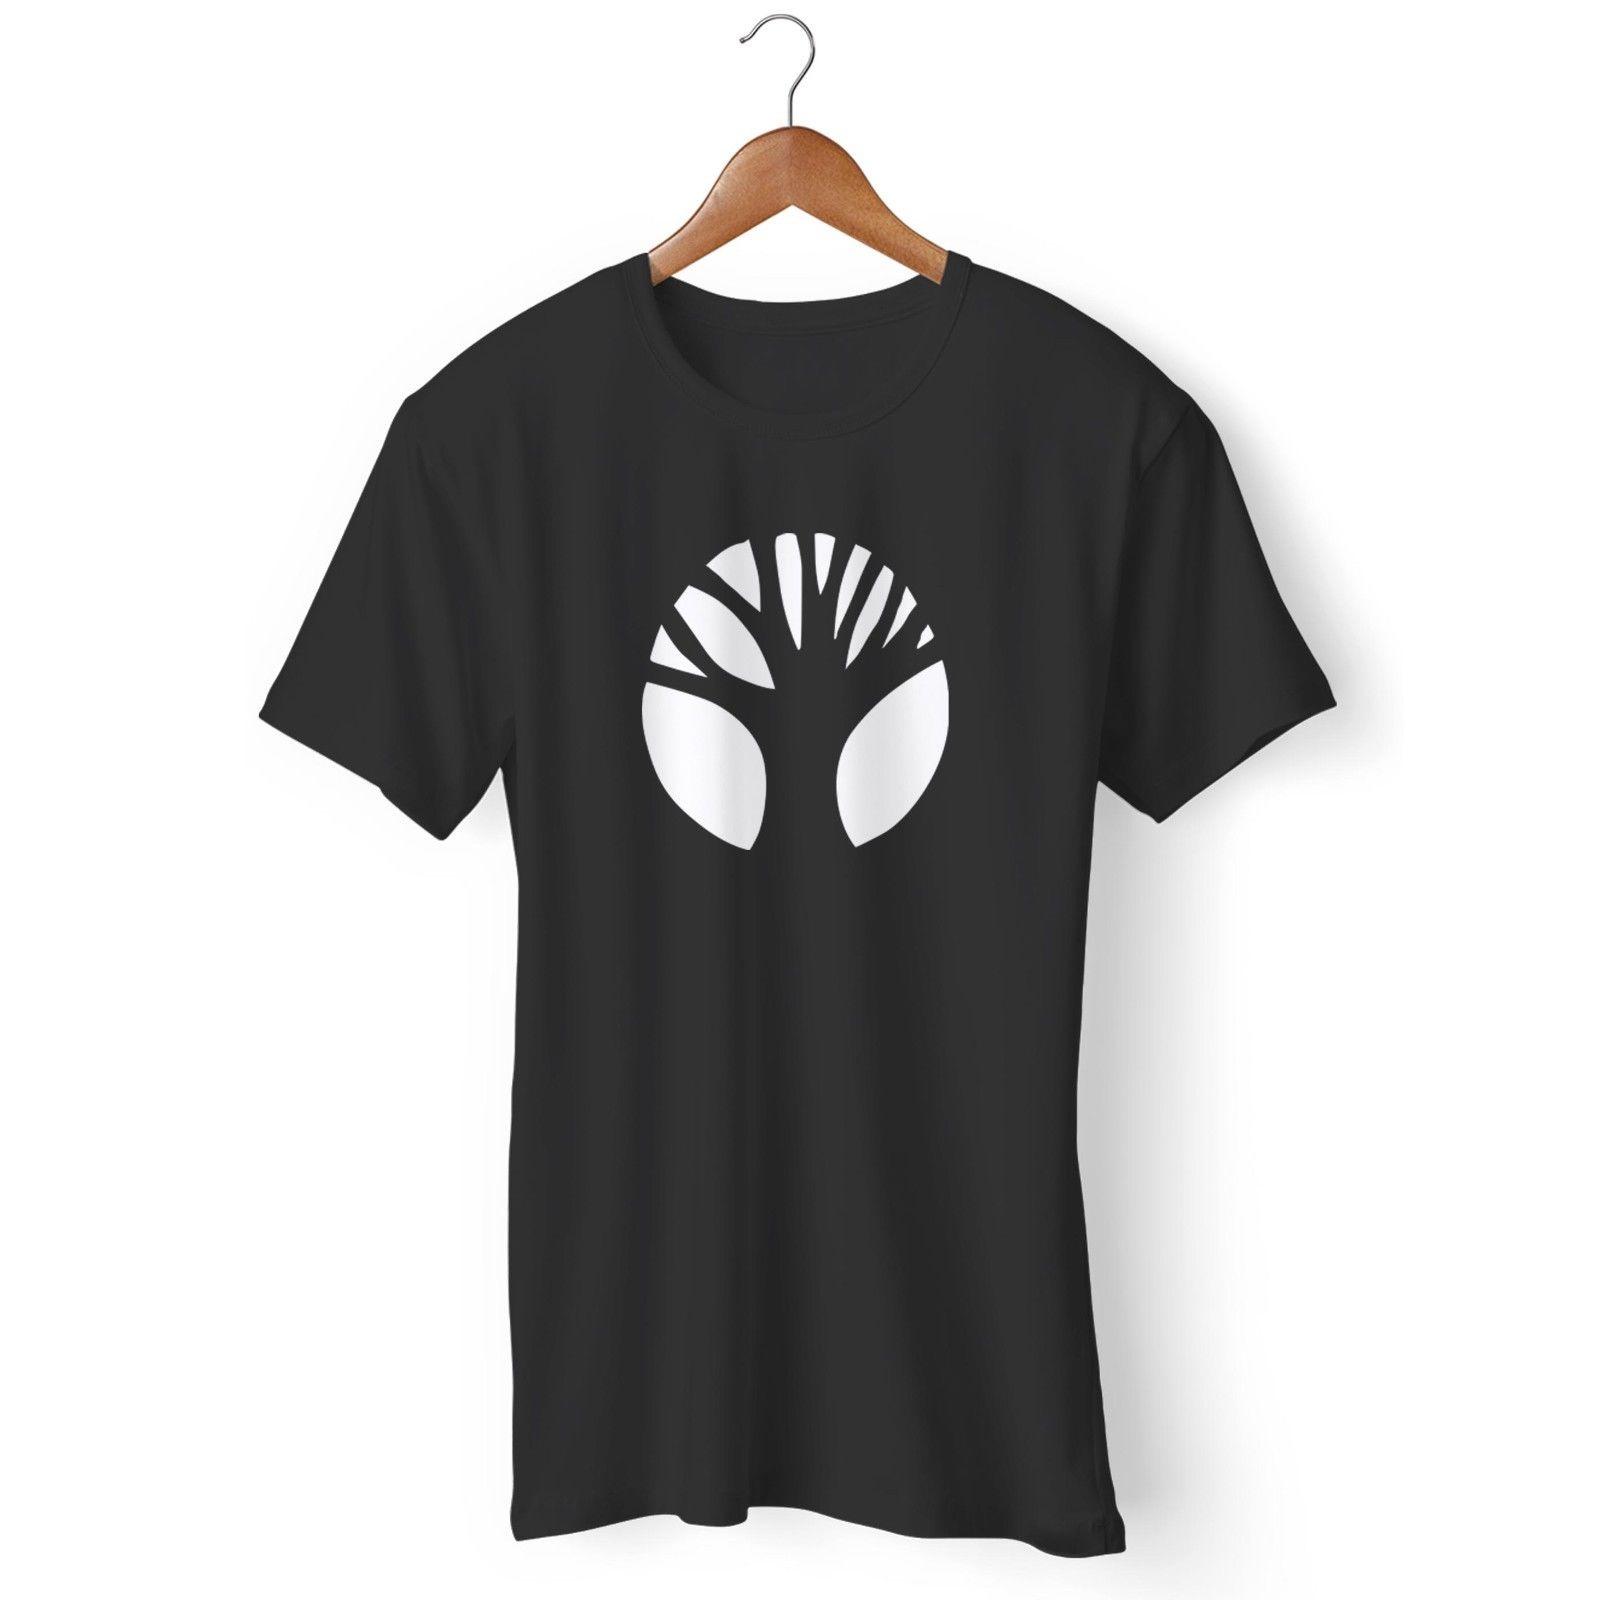 Hippie Tree Of Life Cutout Pastel Goth Grunge Boho Man's and Woman's T-Shirt